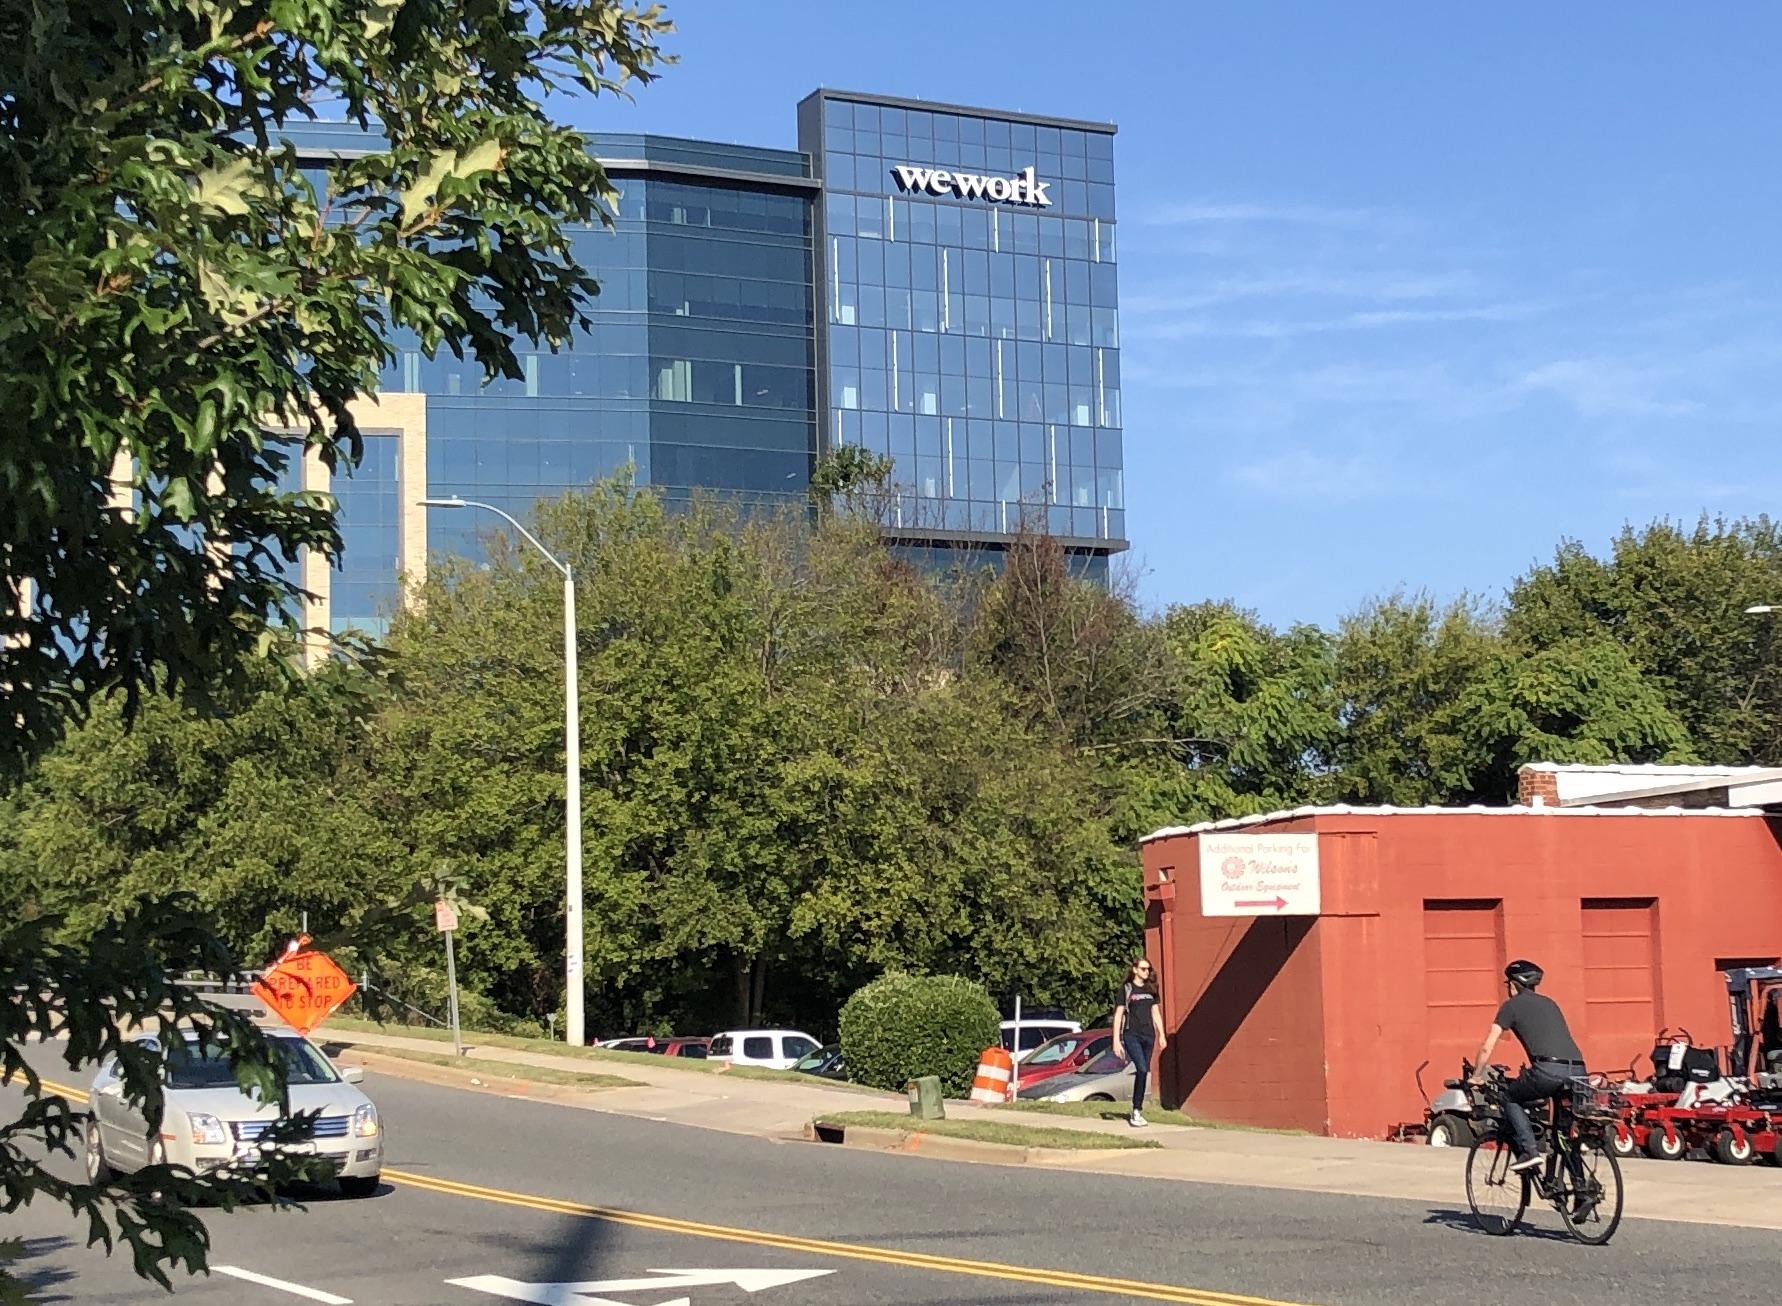 WeWork building in Raleigh, North Carolina